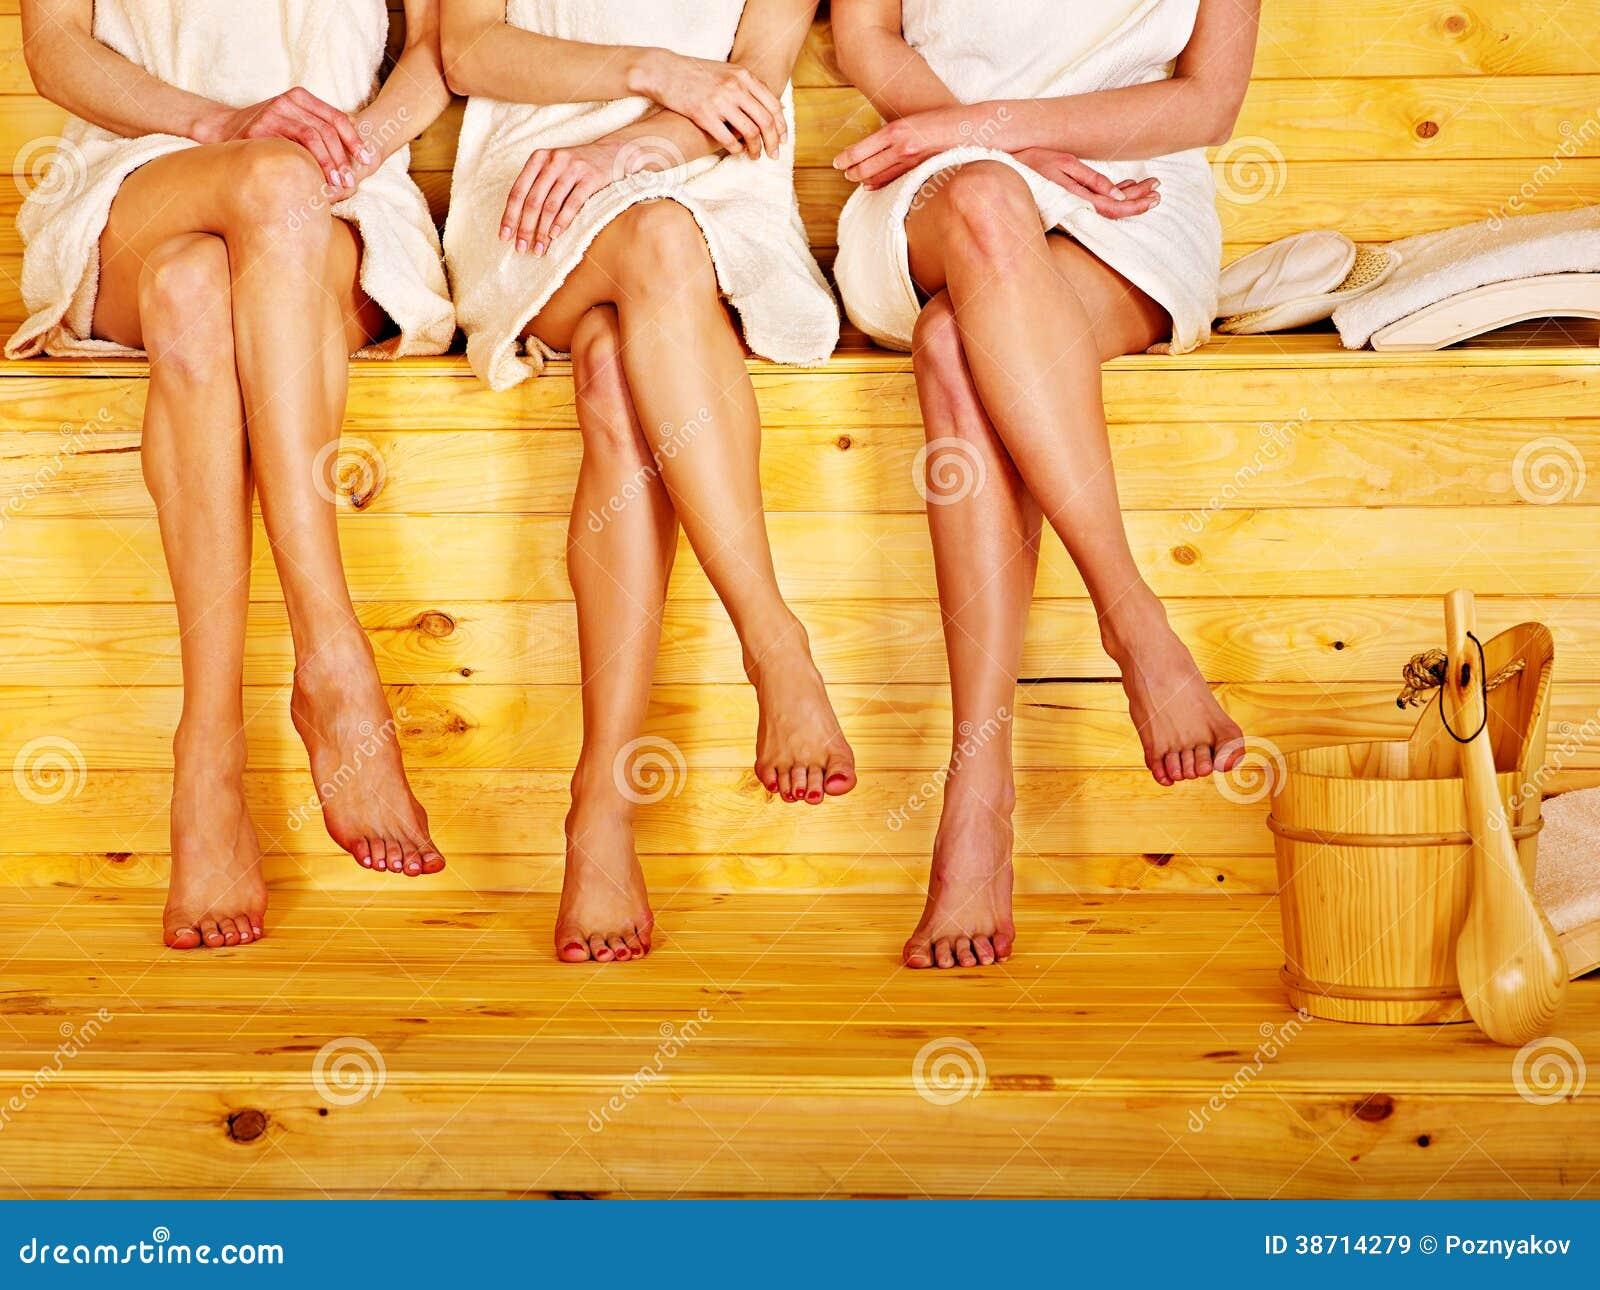 Фото женщин за 25 сауна 7 фотография